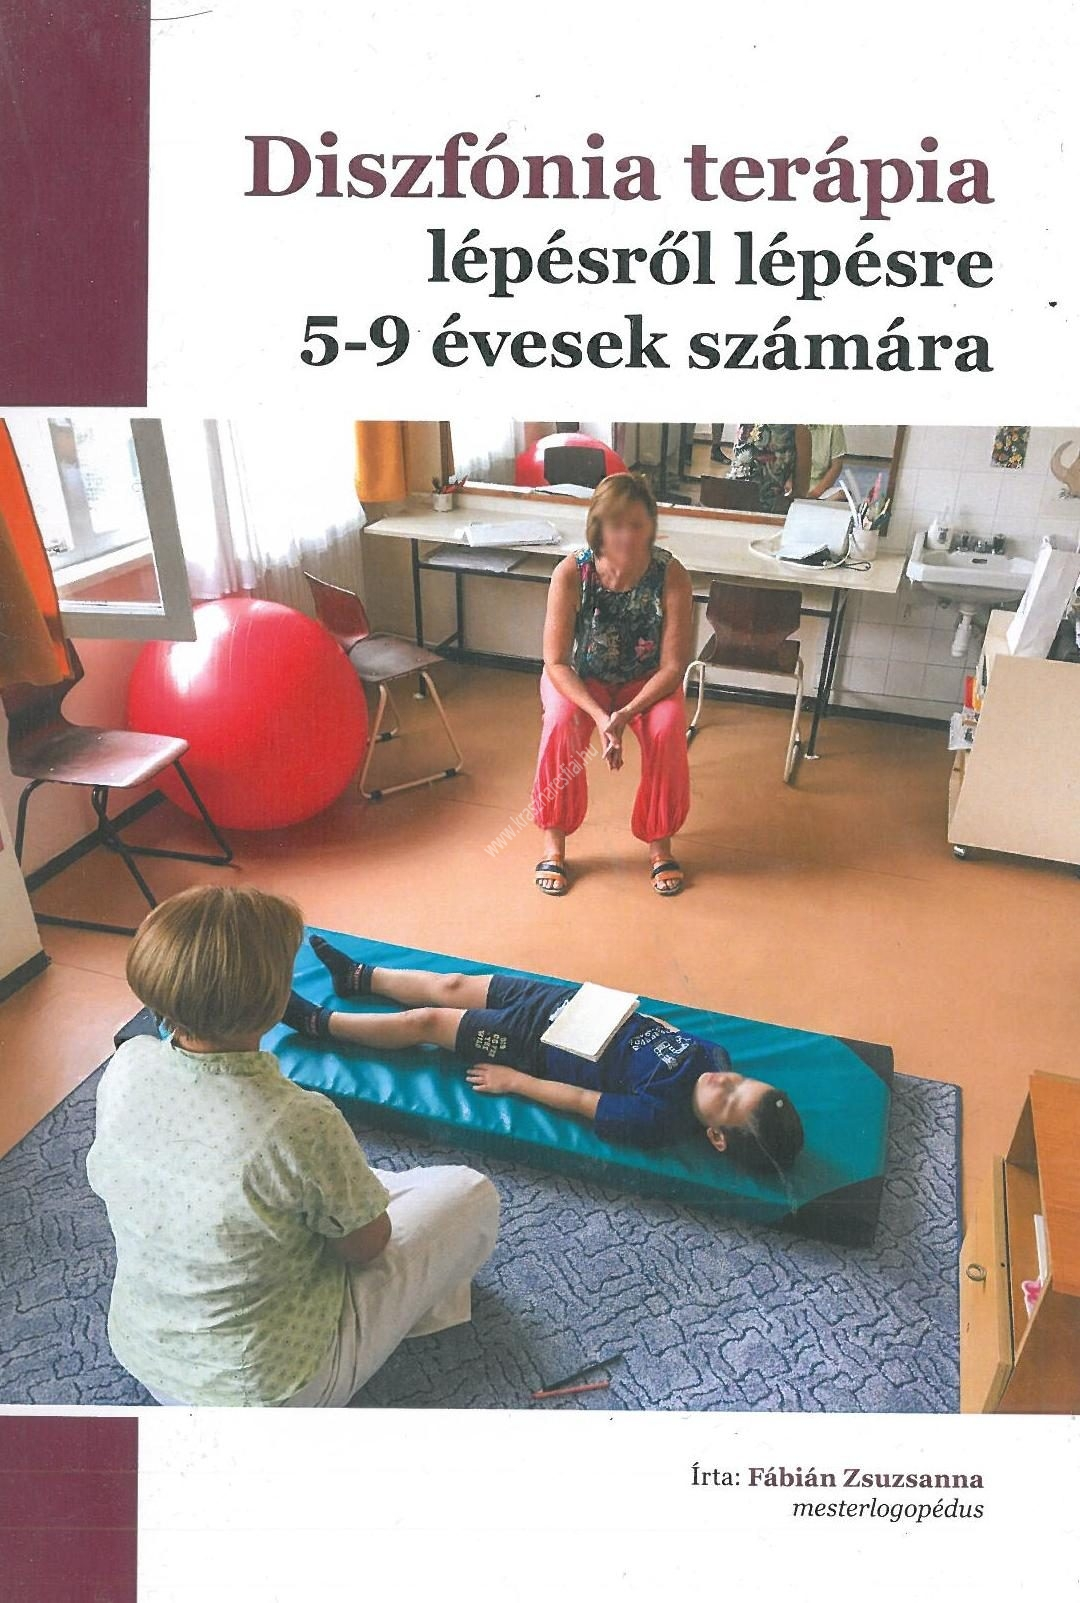 diszfonia-terapia-lepesrol-lepesre